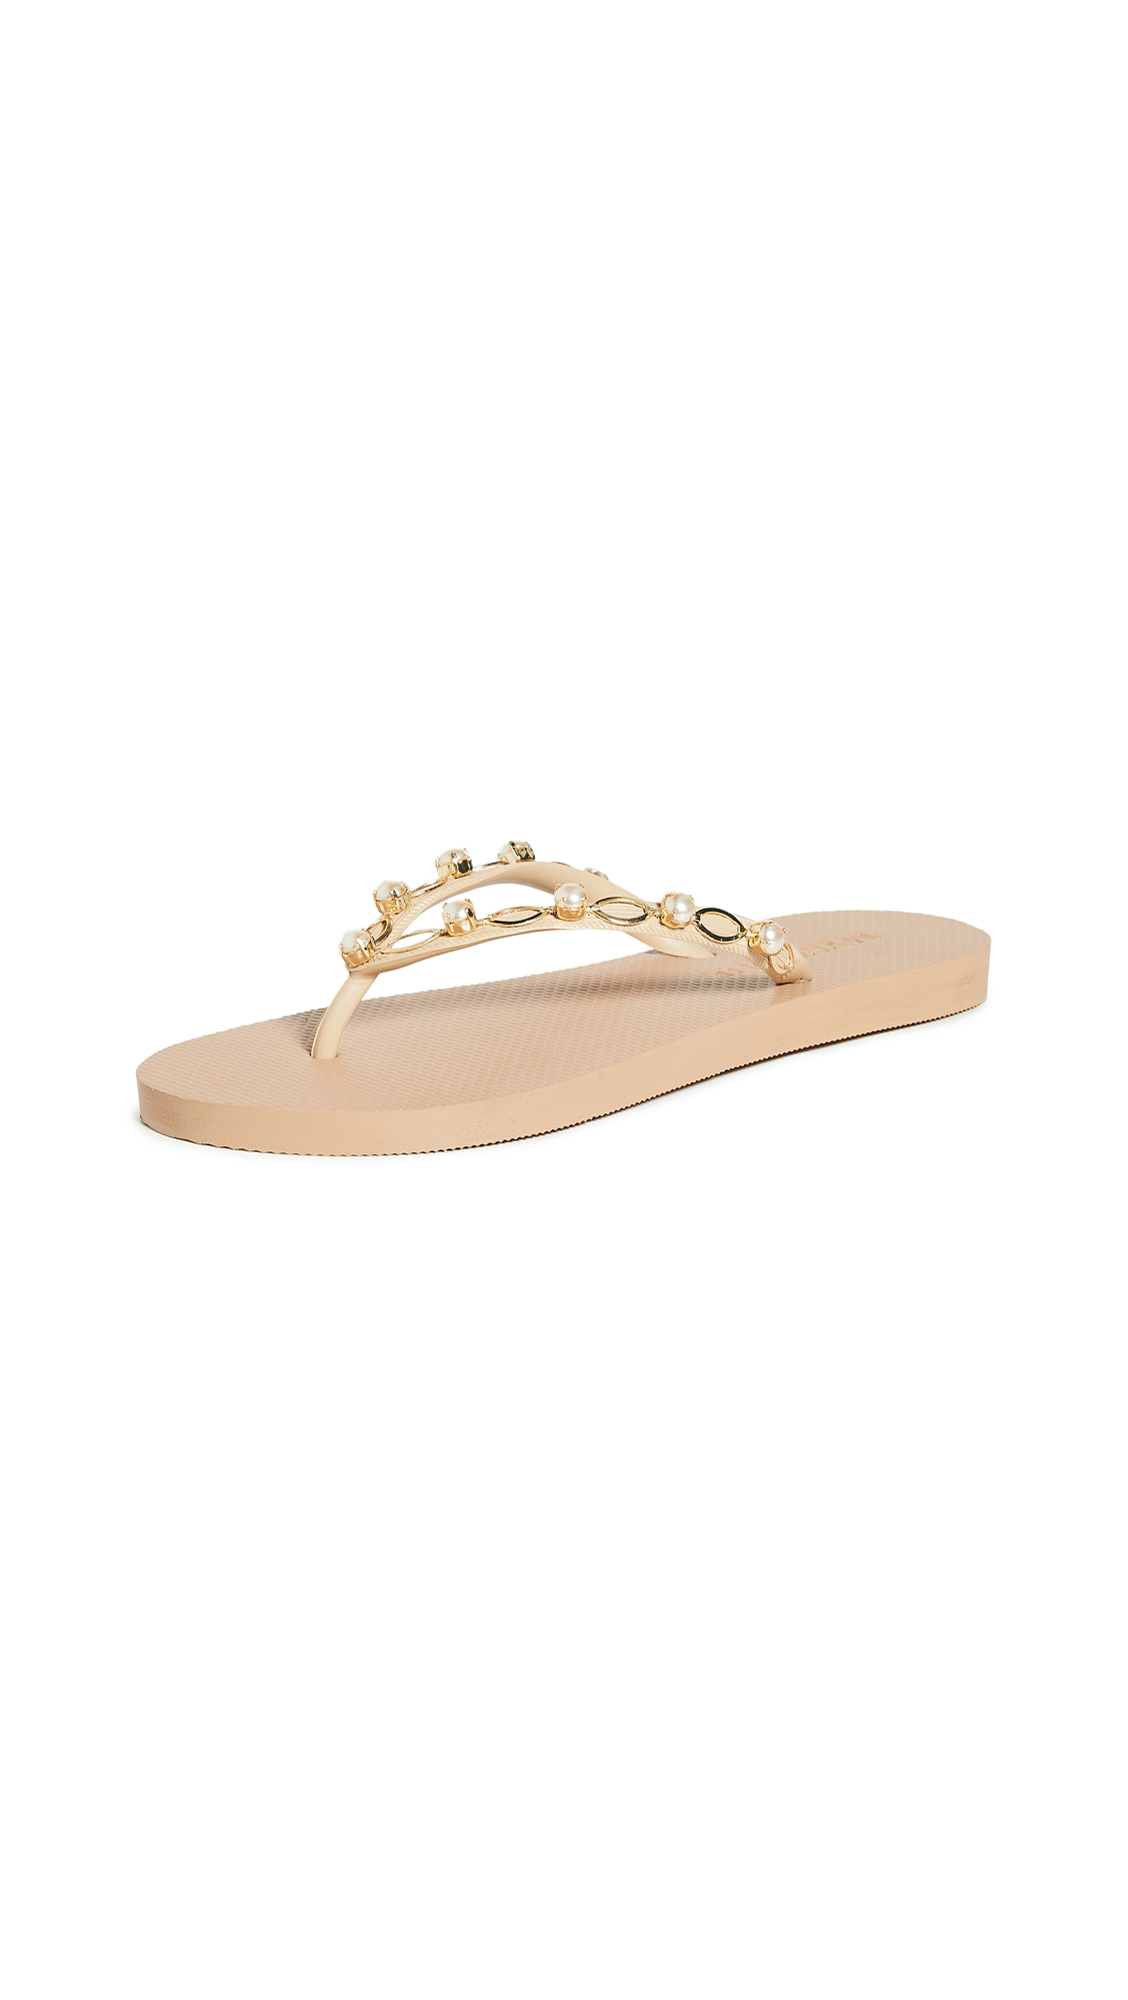 Buy Mystique Pearl Flip Flops online, shop Mystique